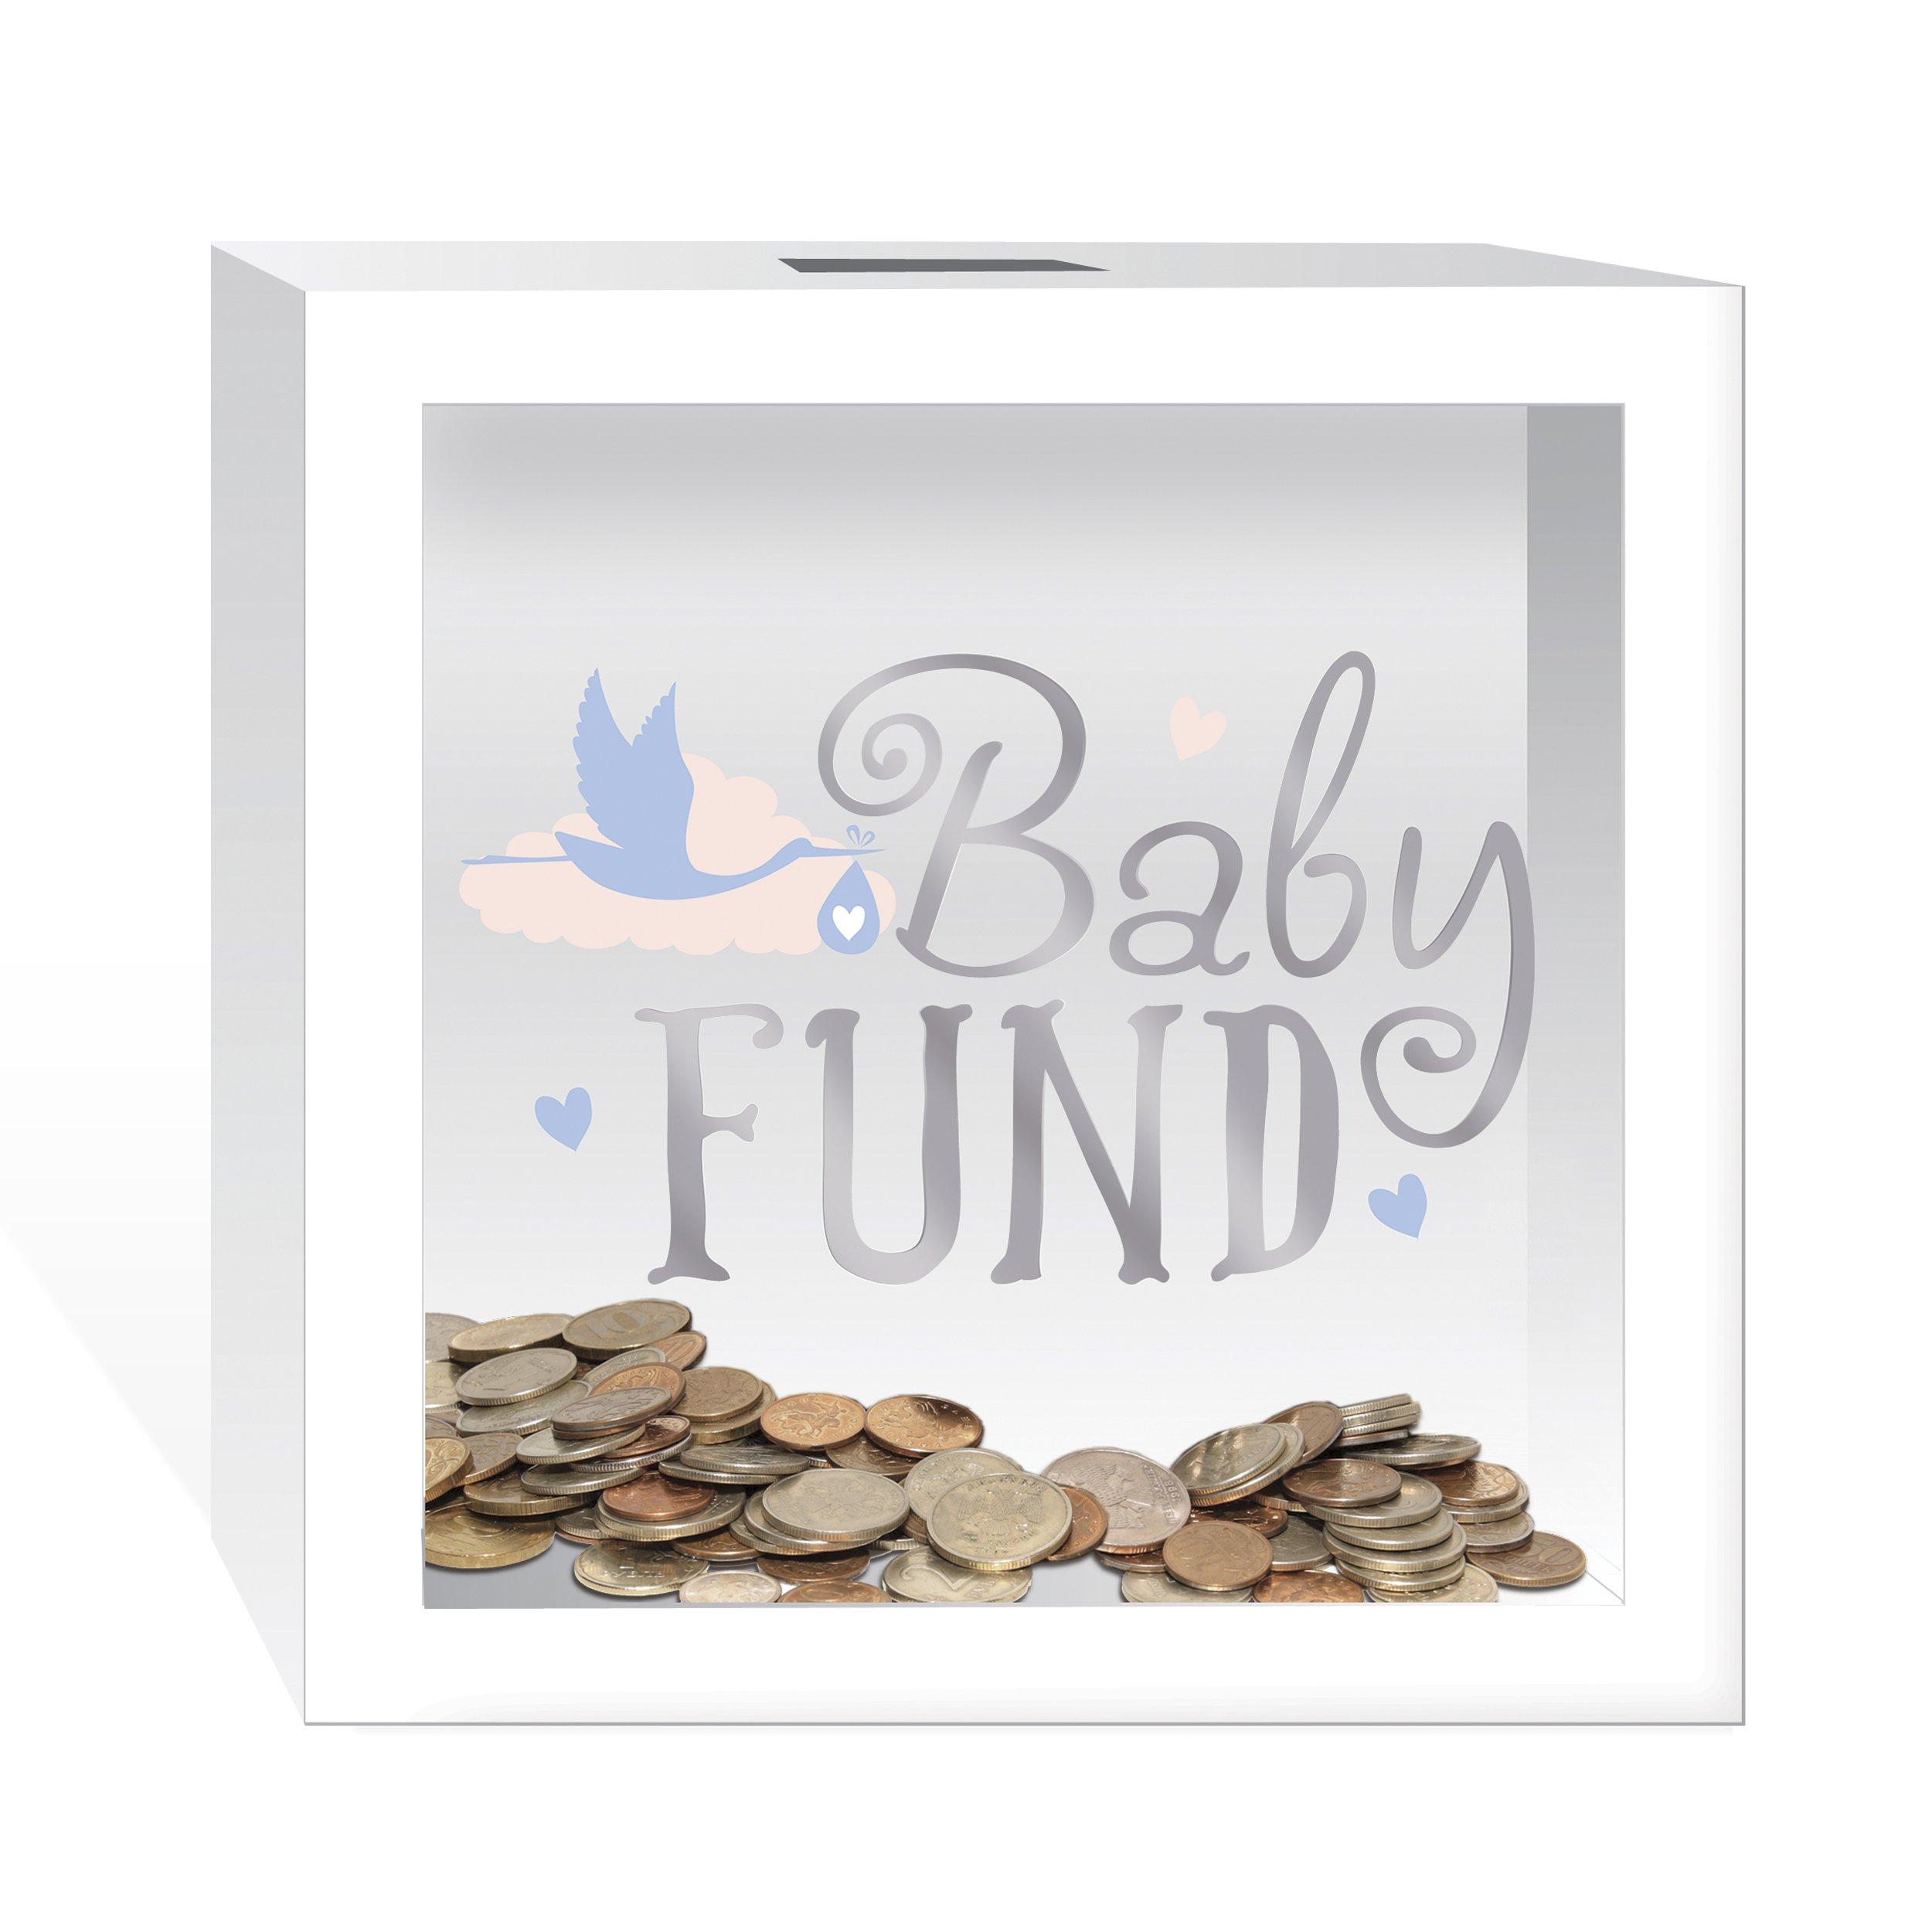 PRINZ 4661-6009 Baby Fund Wooden Bank